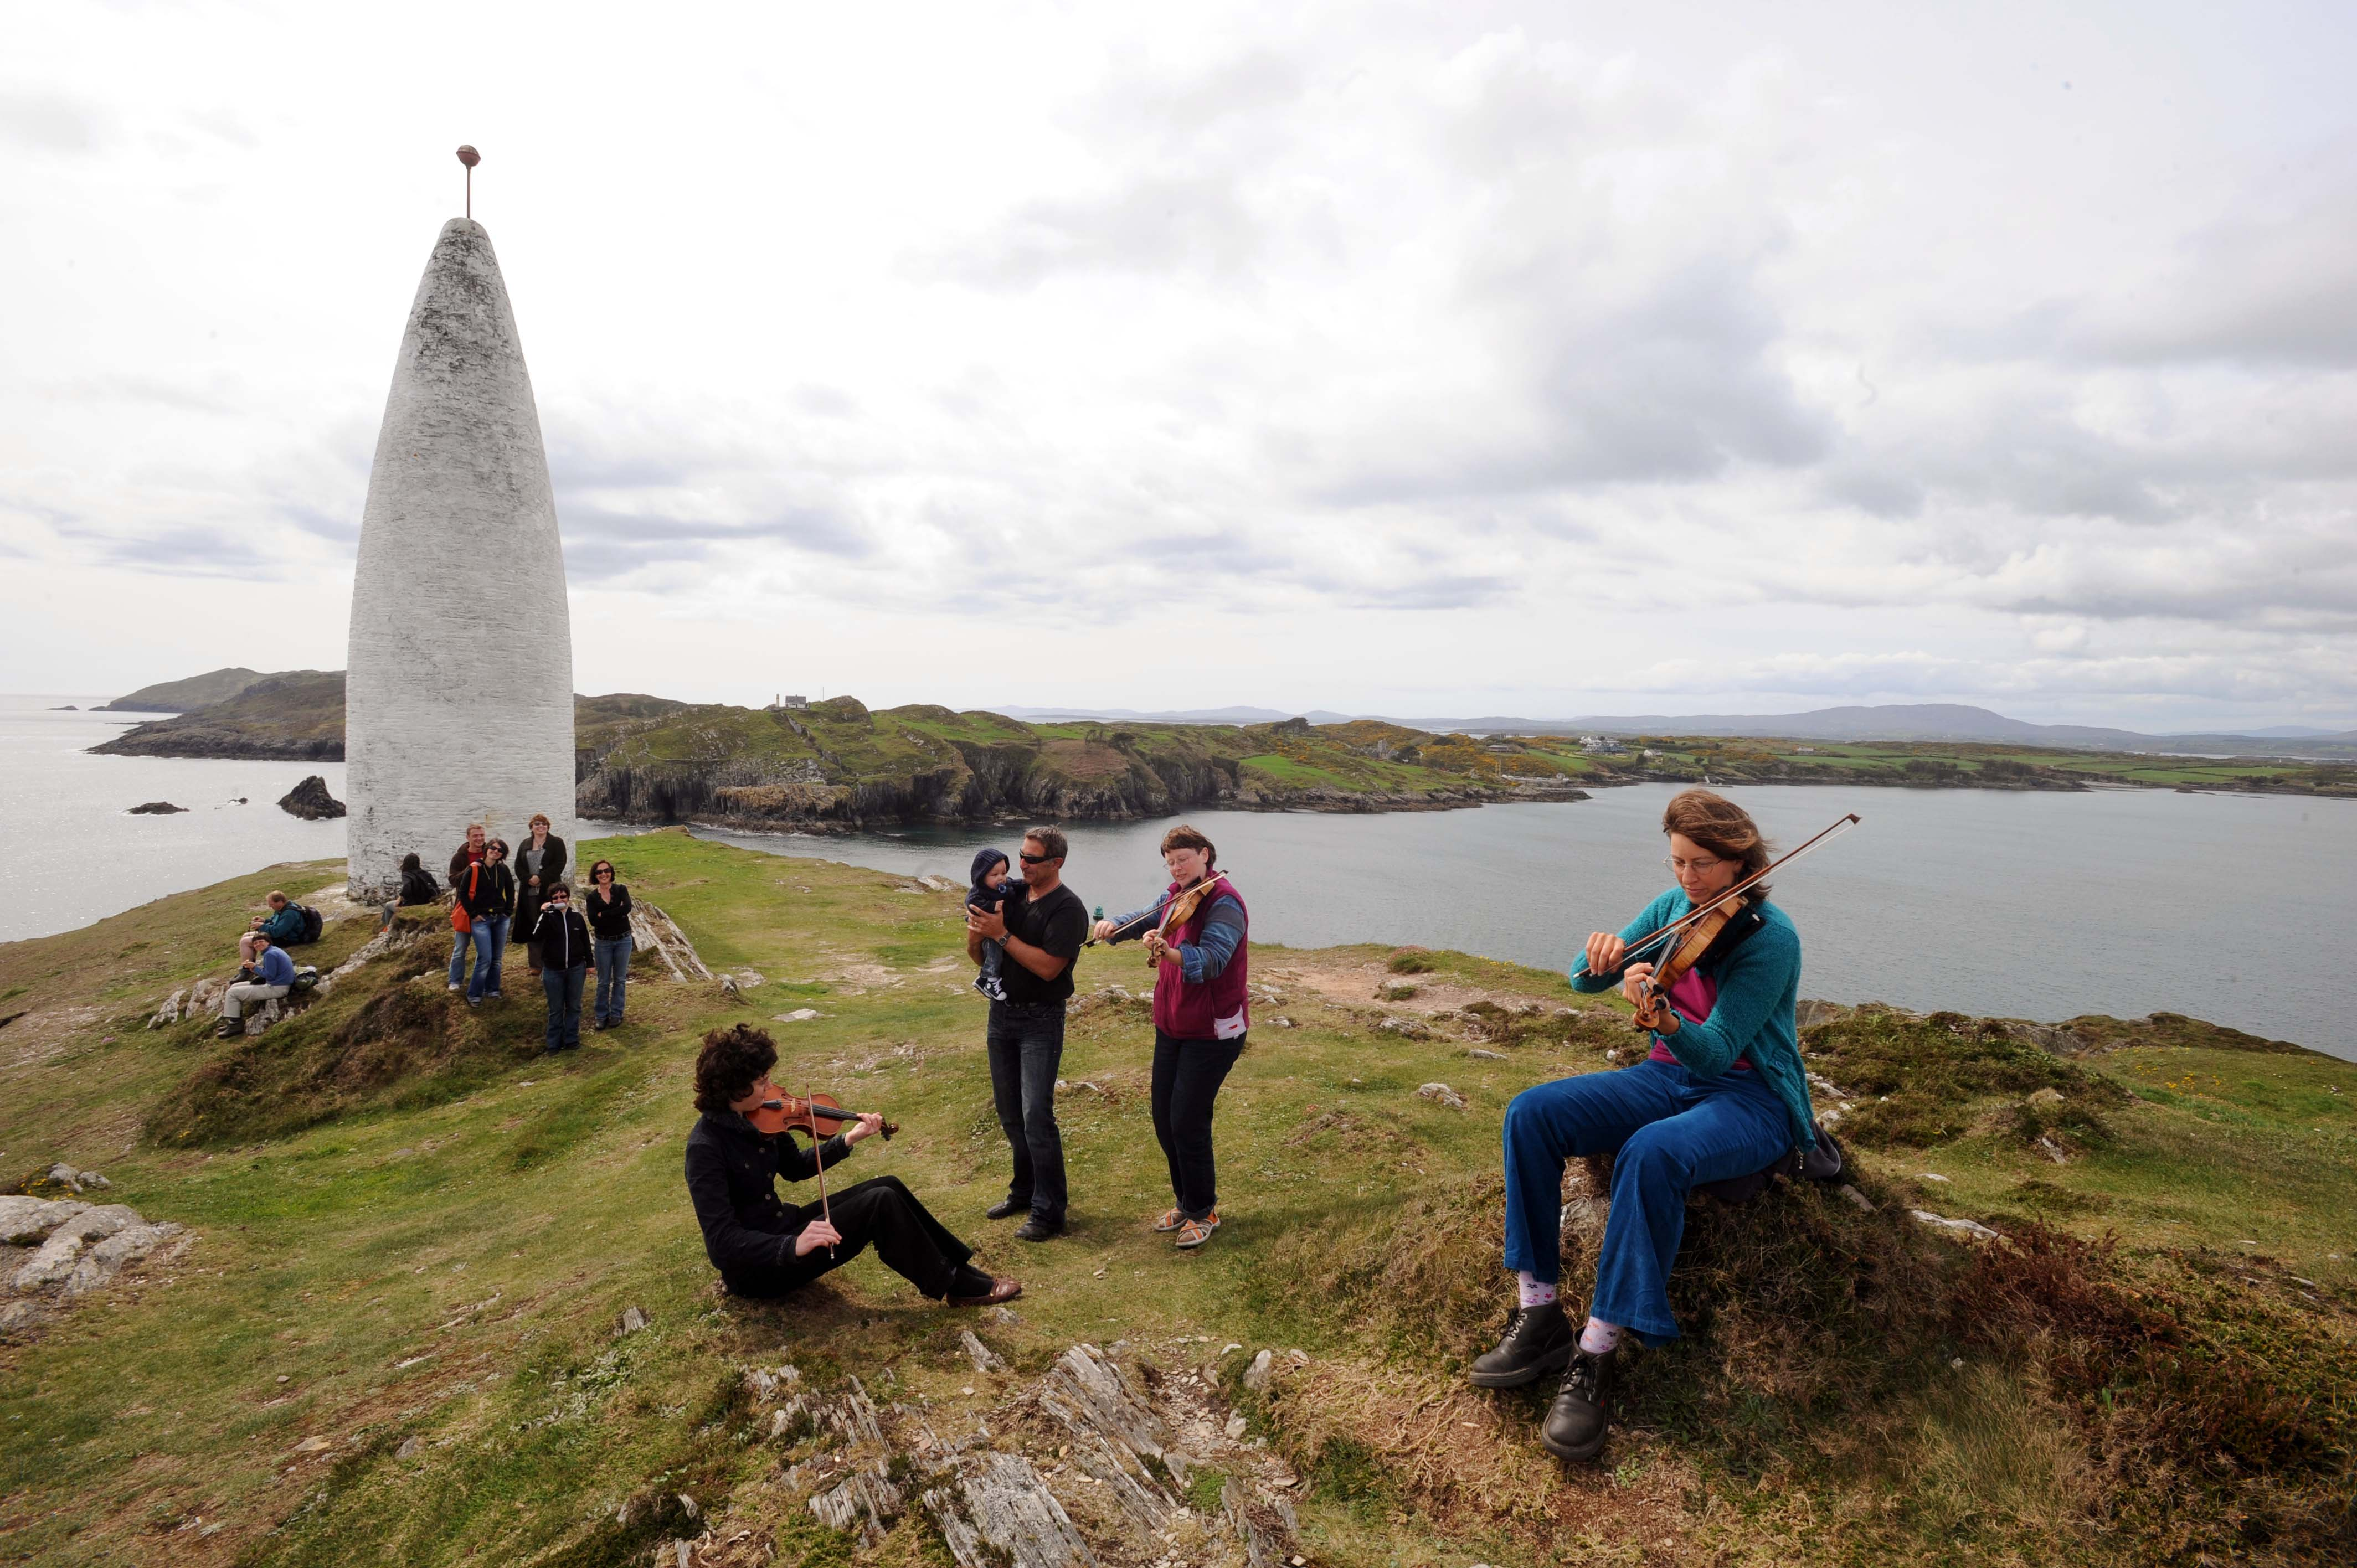 baltimore fiddle fair classes lessons tuition irish traditional burren clare ireland